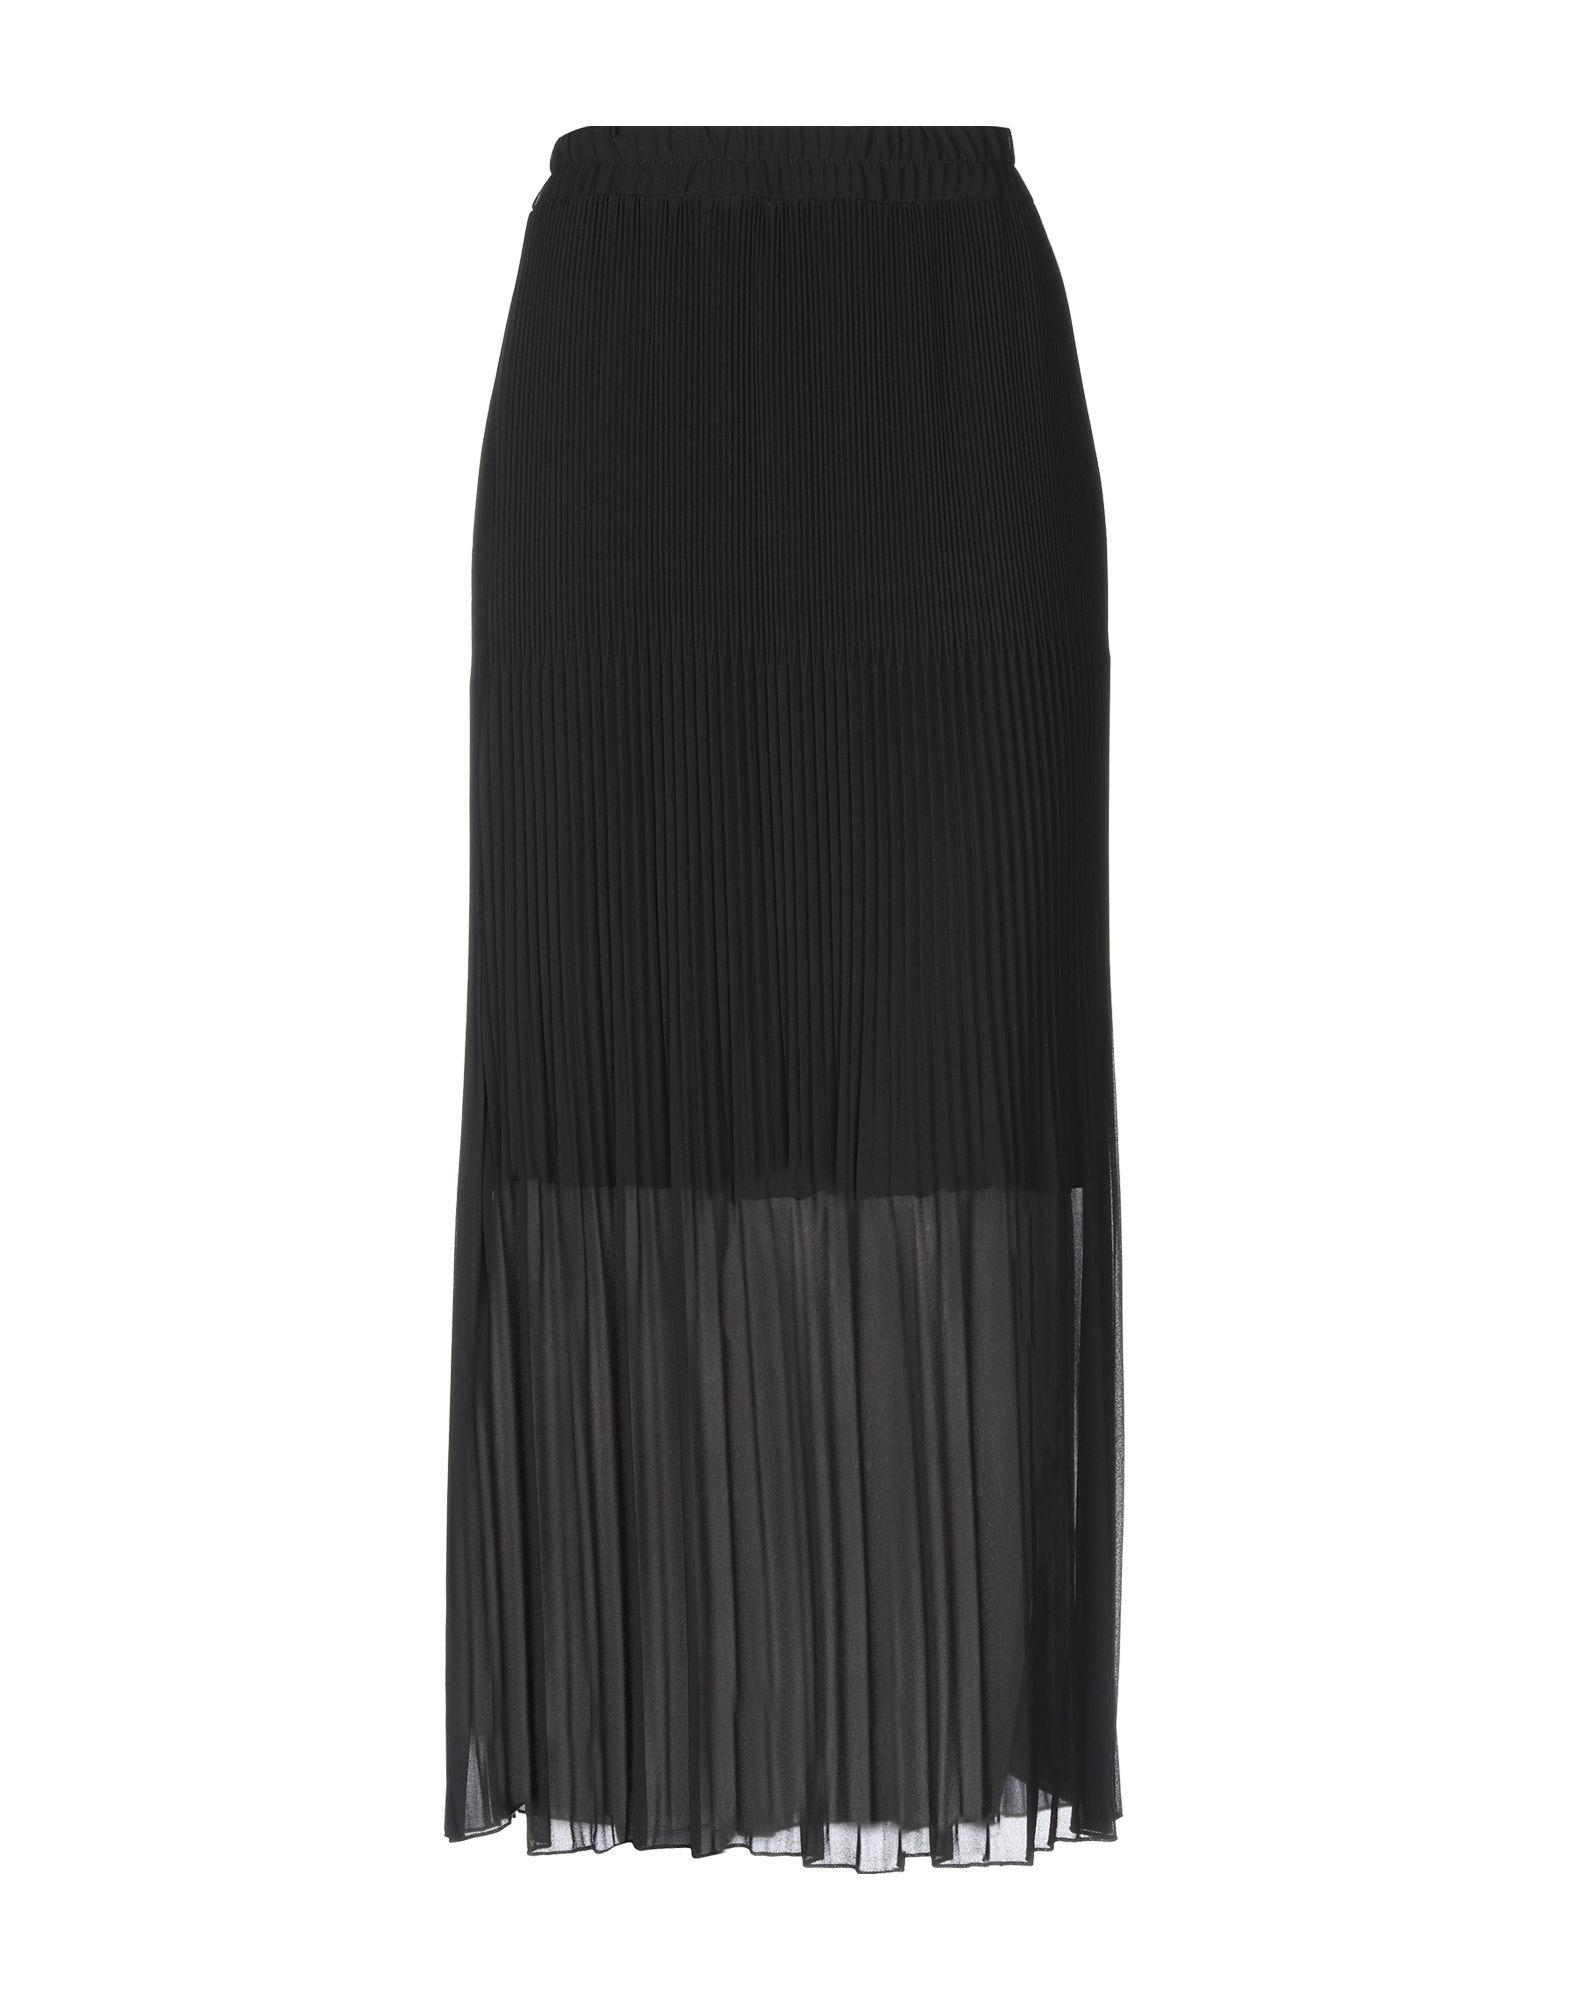 CLUB VOLTAIRE Юбка длиной 3/4 vdp club юбка длиной 3 4